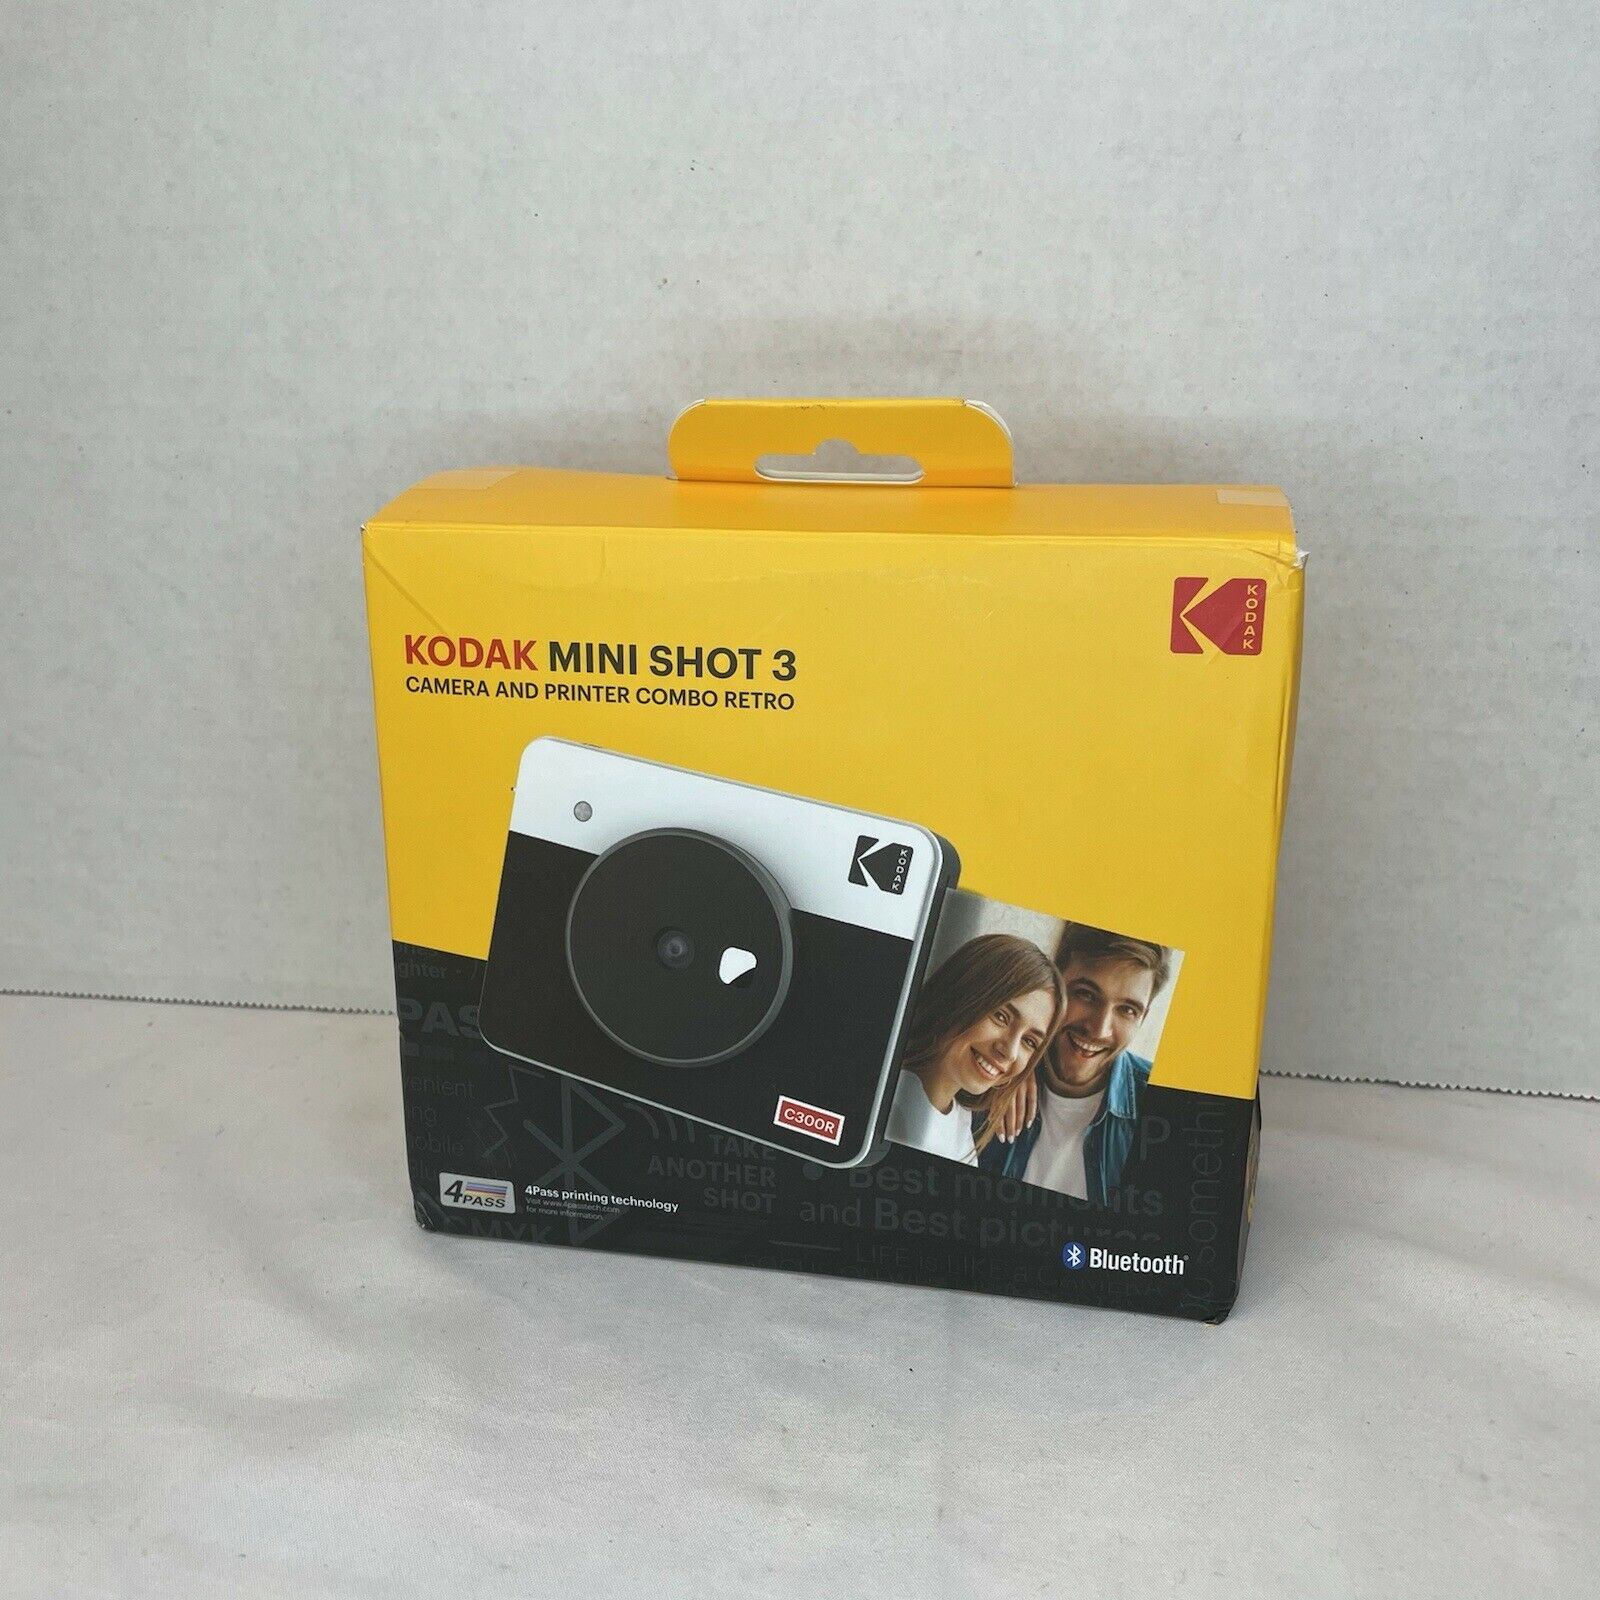 Kodak Mini geschossen 3 retro Portable Wireless Instant Kamera /& Foto-Black Tasche nur Kodak komplett neue Mini Aufnahmen 3 Quadrat Schwerer Koffer f/ür Kodak Mini 3 retro